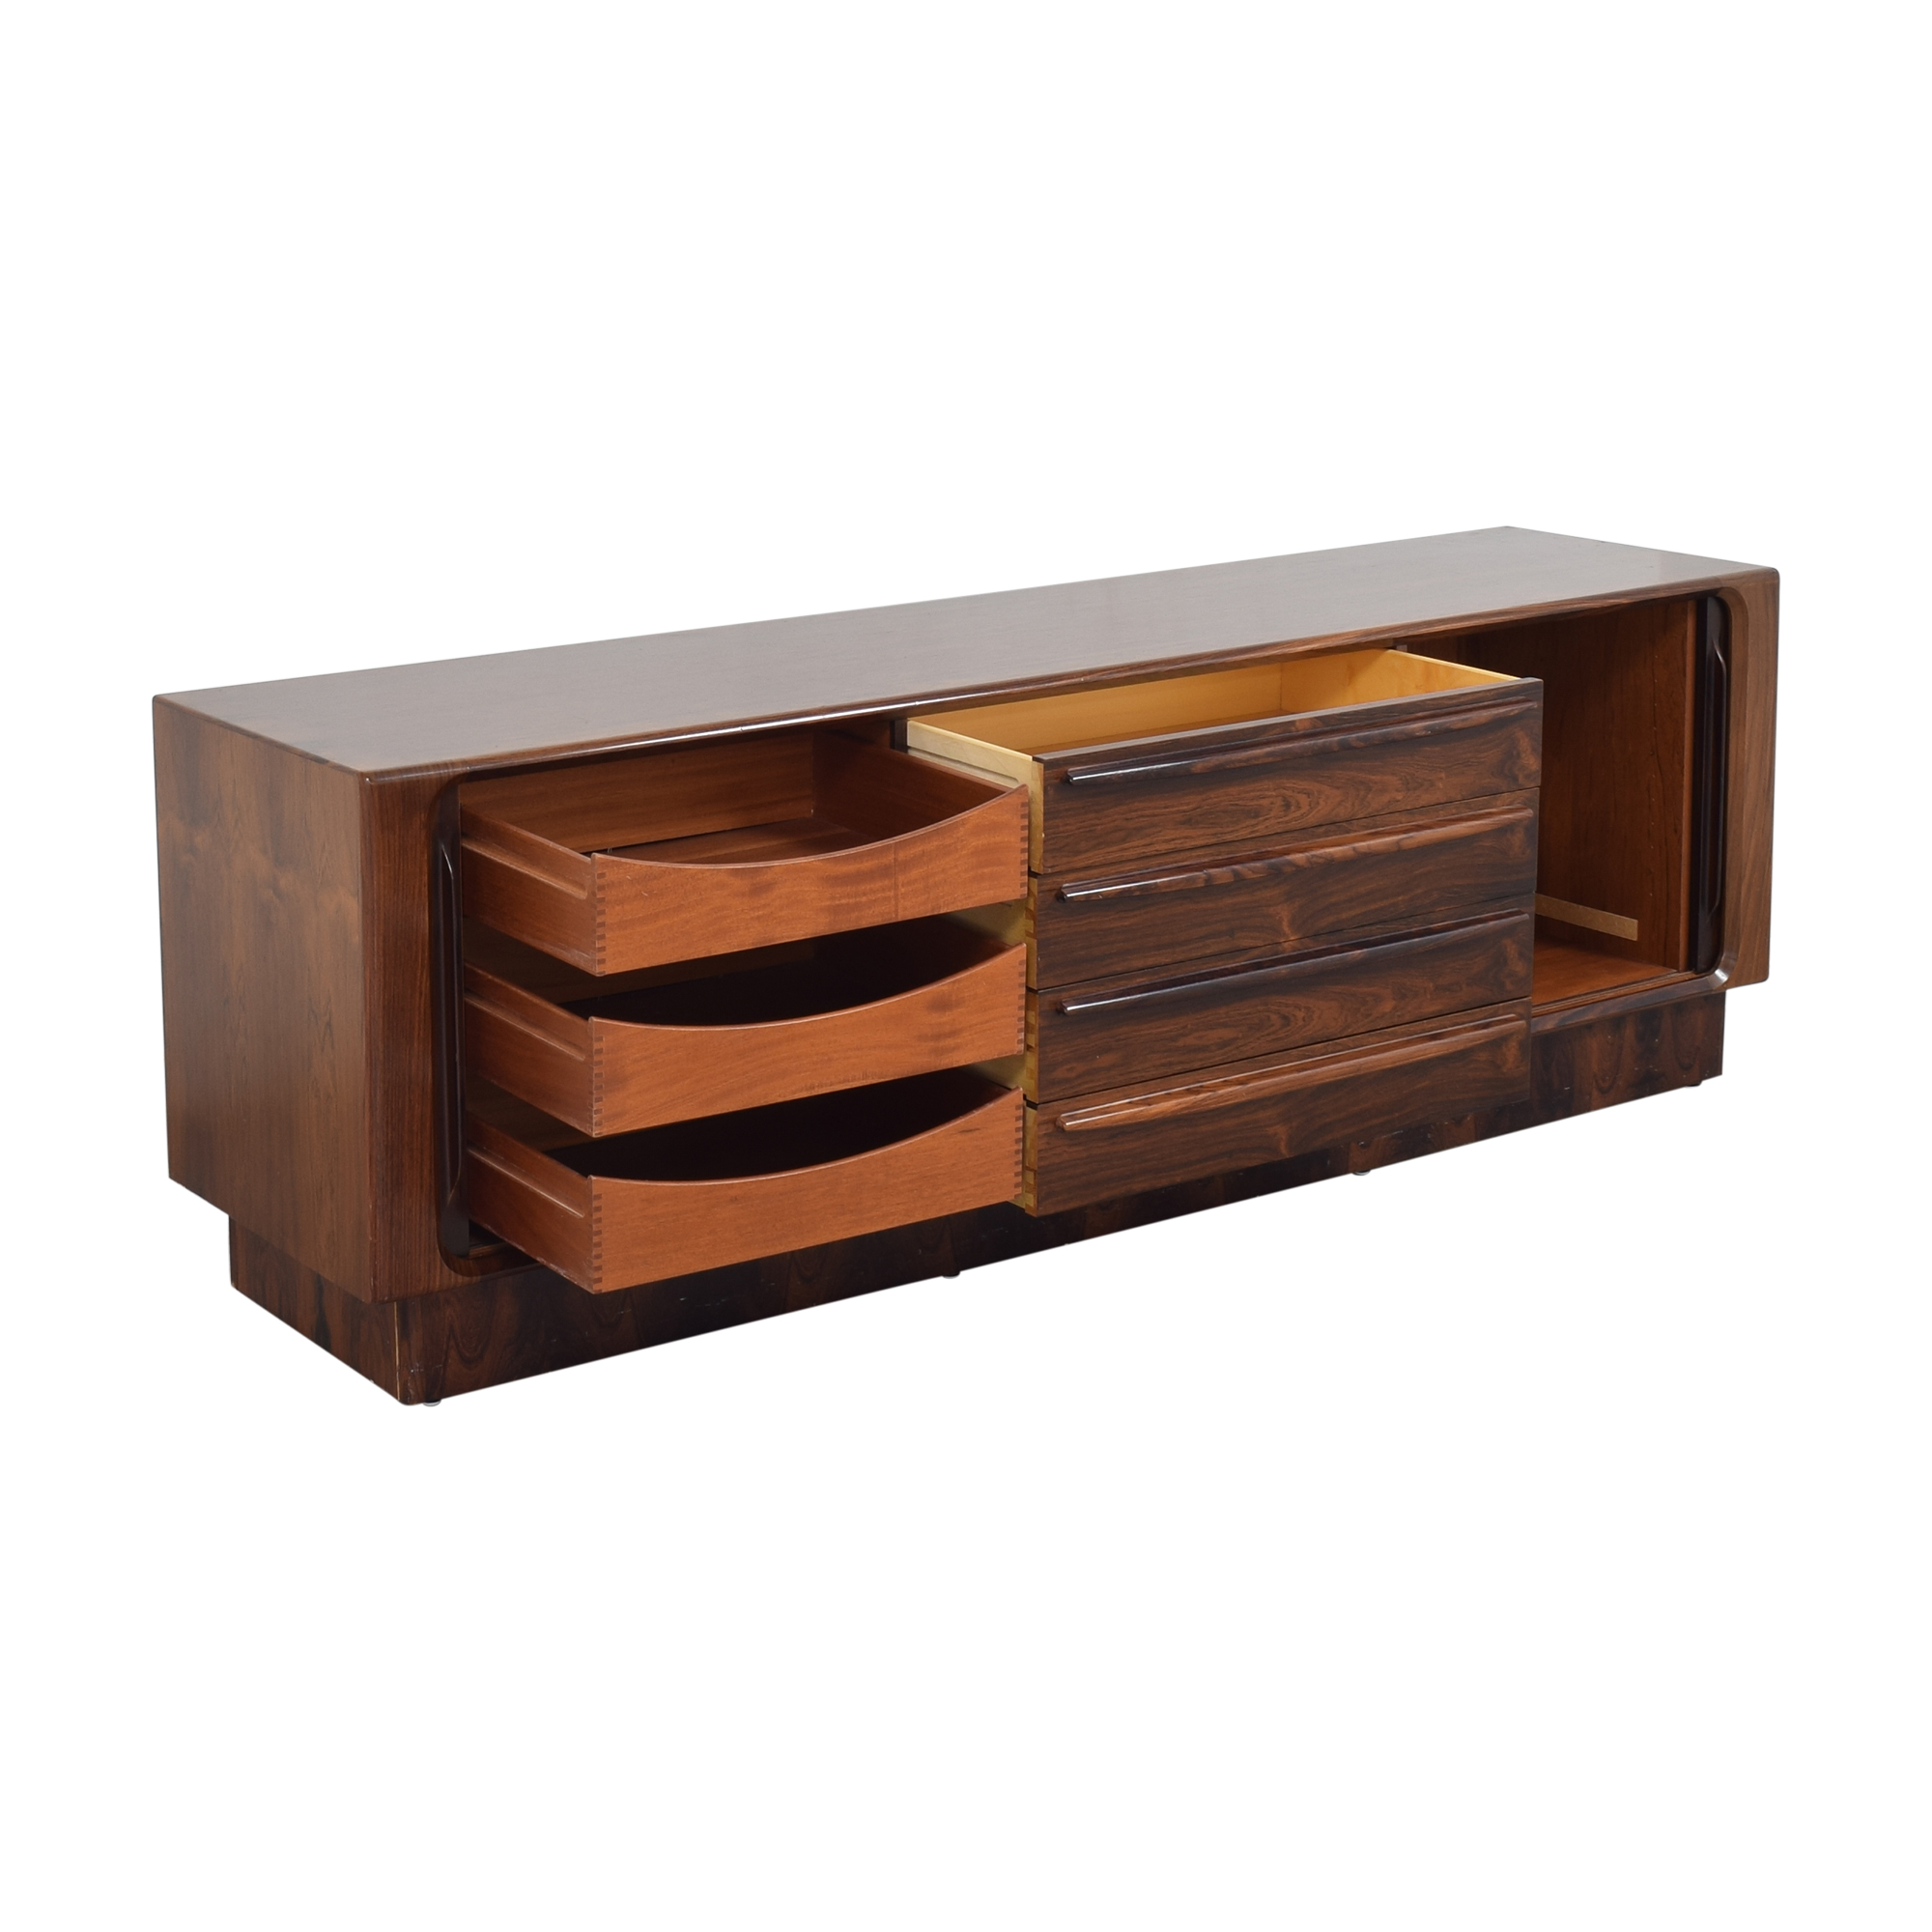 shop Maurice Villency Danish Triple Credenza Maurice Villency Cabinets & Sideboards